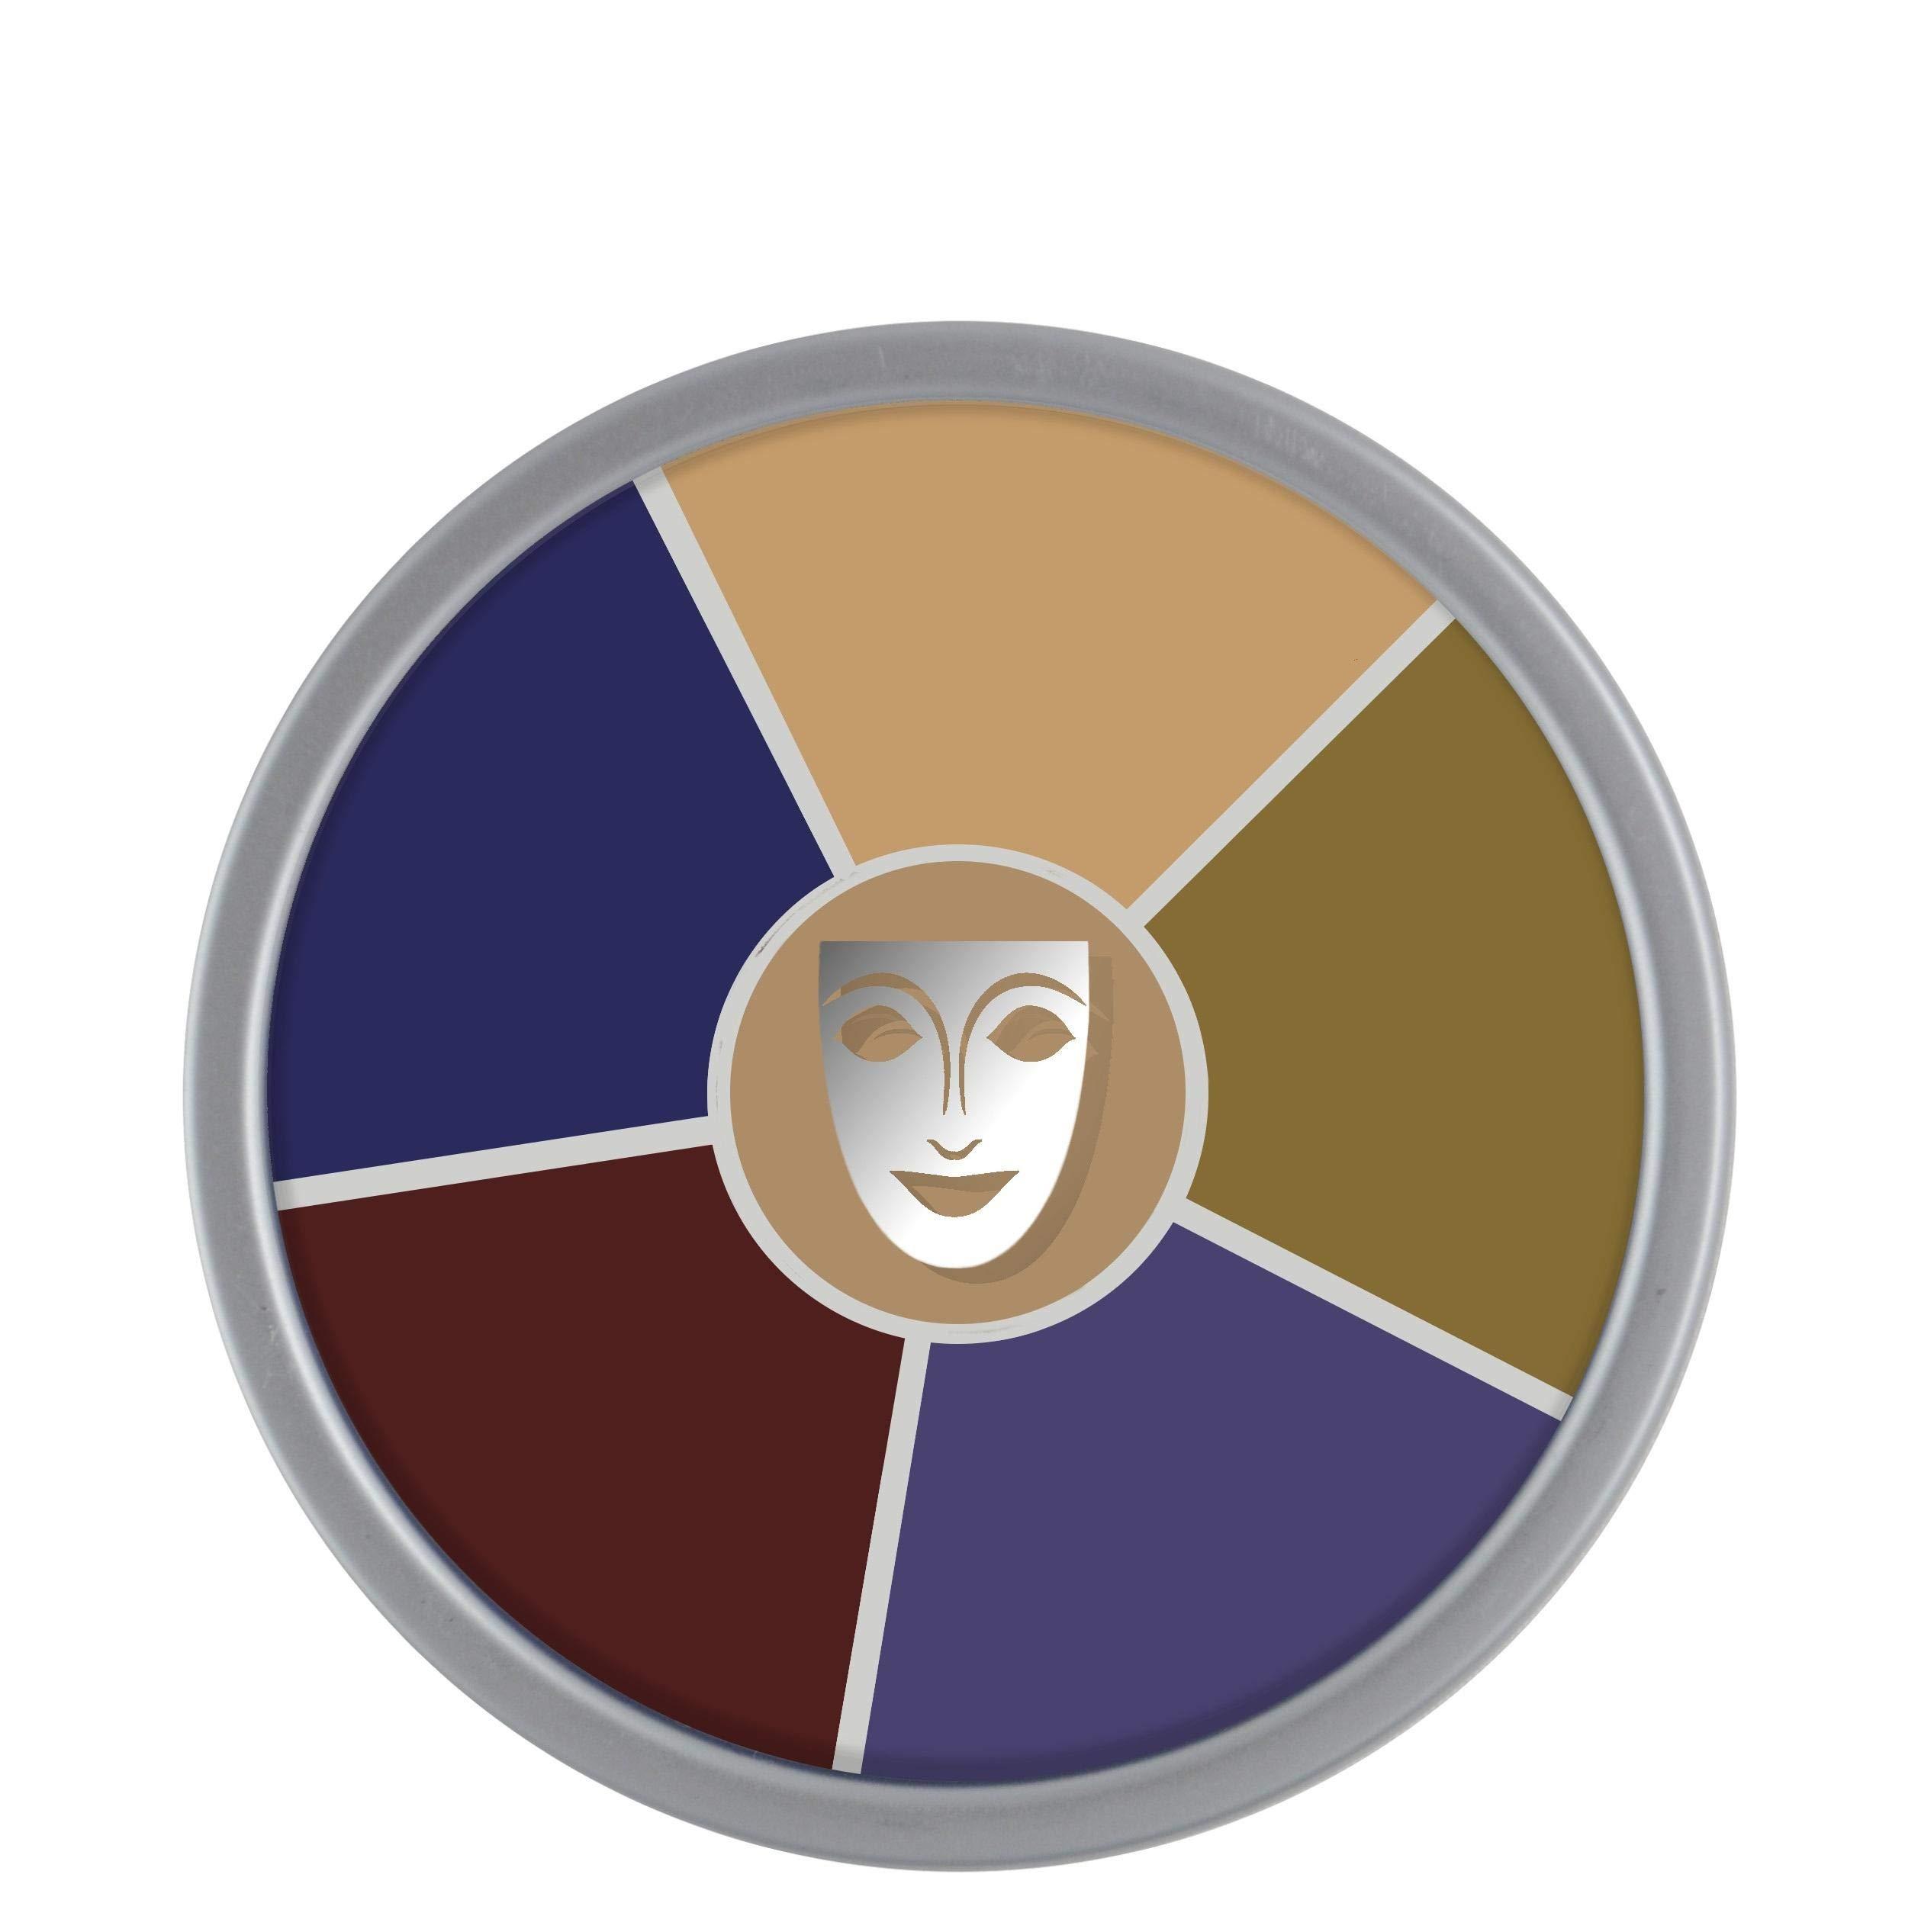 Kryolan Cream Color Circle 1306 Bruise Makeup Palette 6 Colors